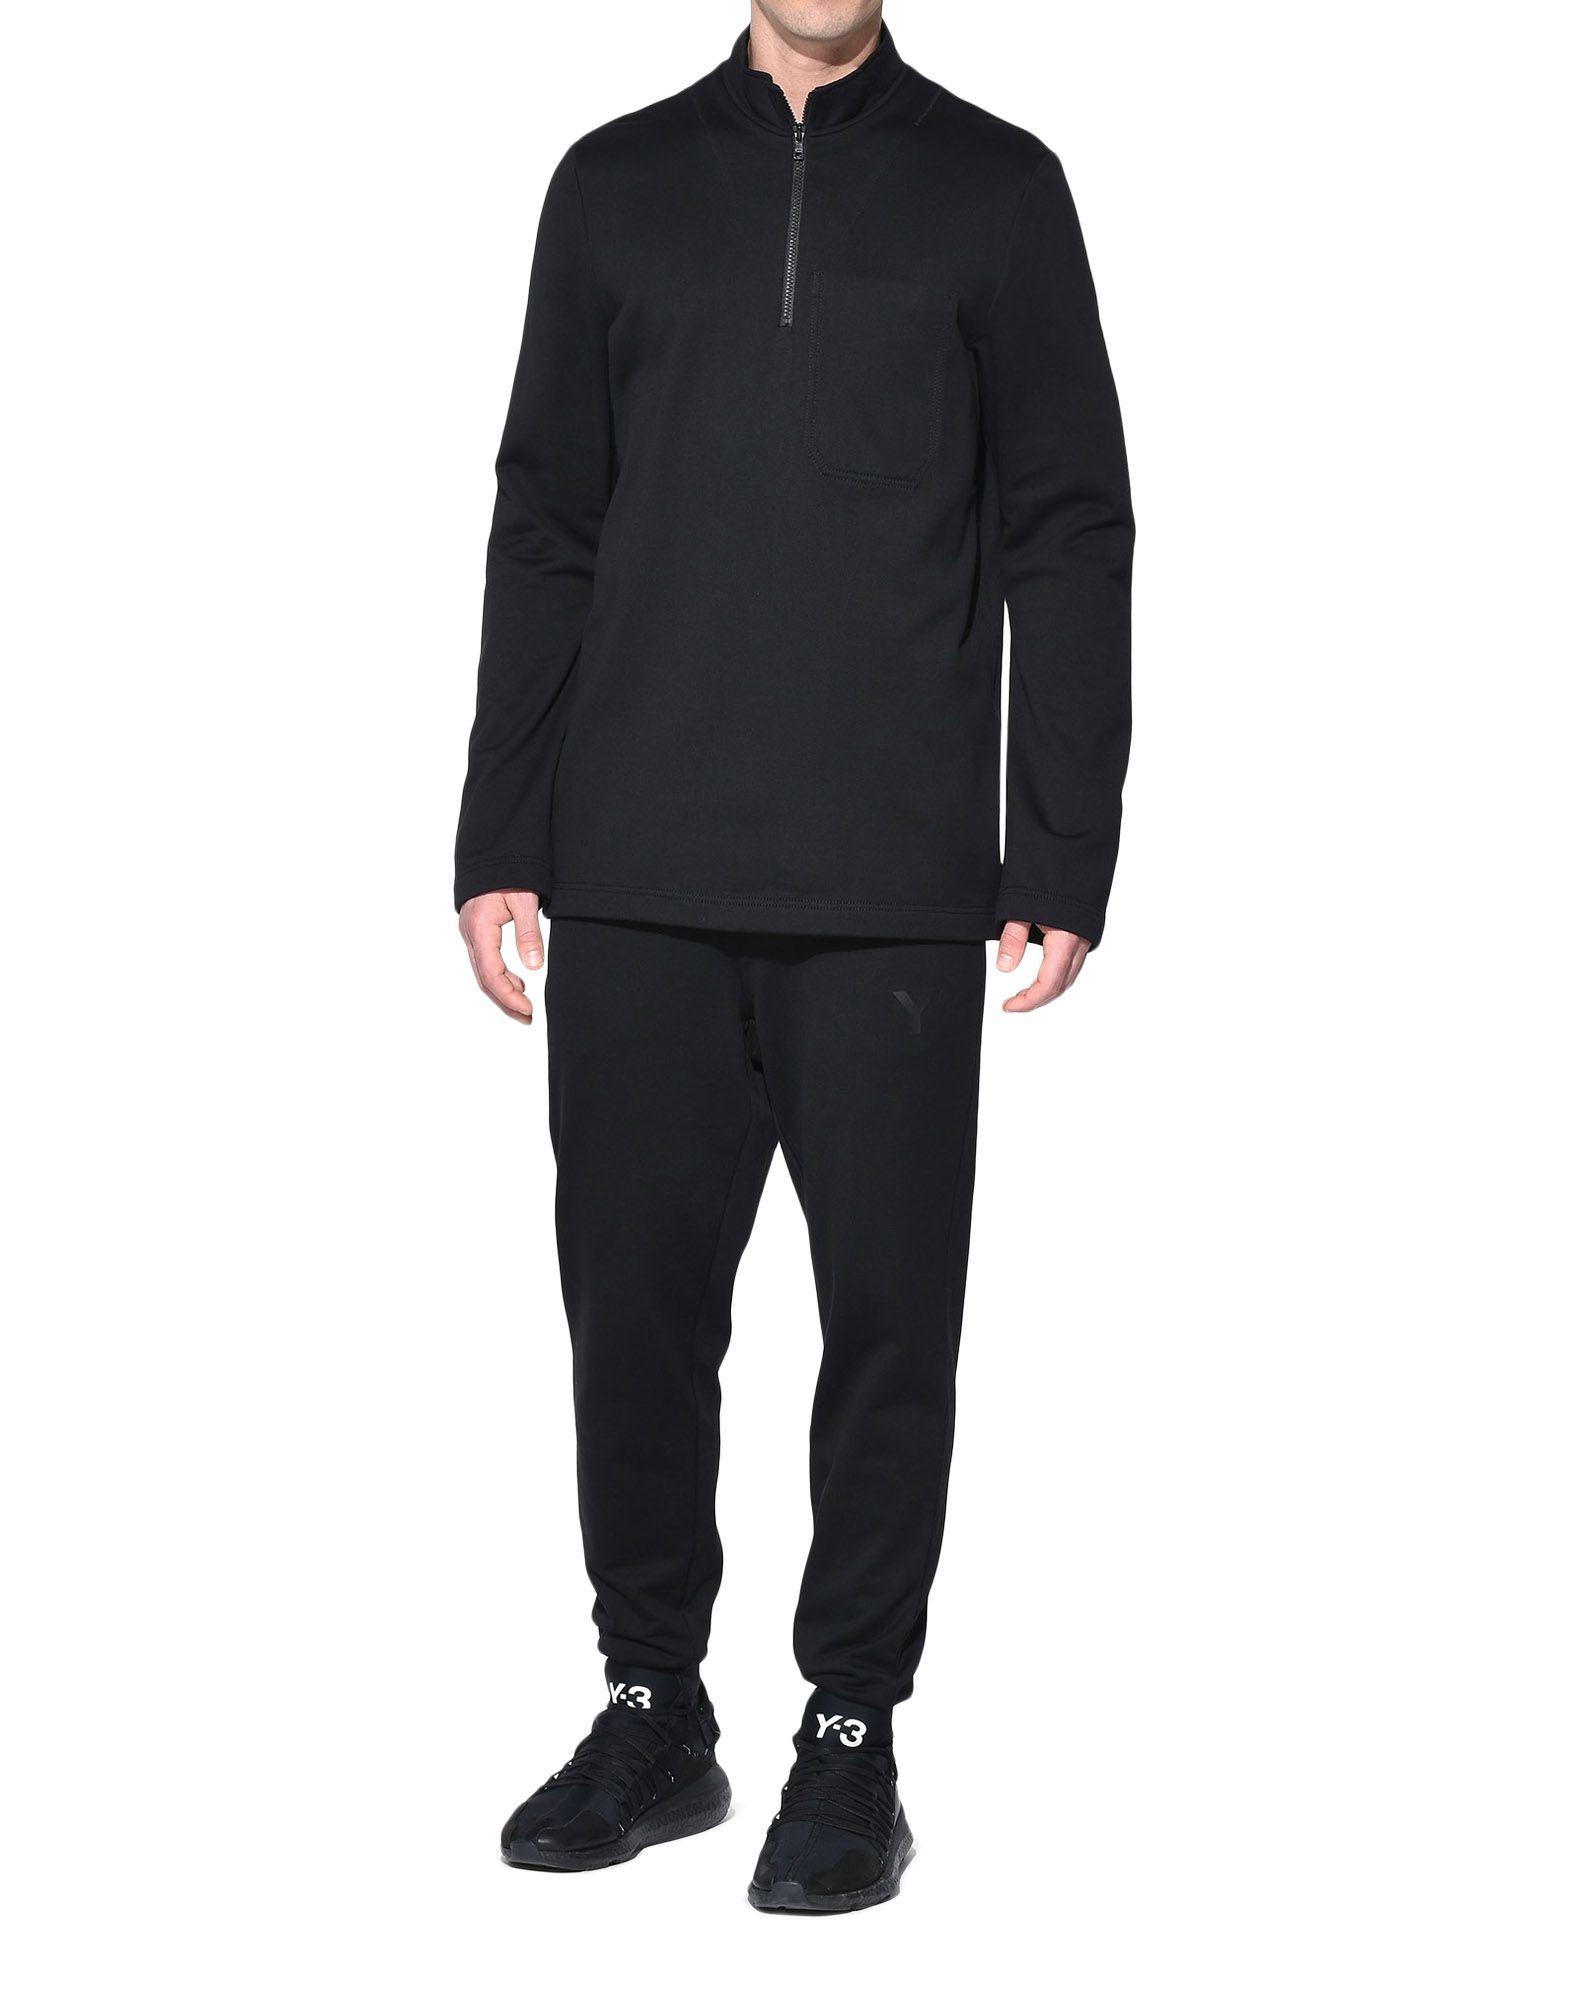 Y-3 Y-3 Sashiko Sweater Sweatshirt mit Zipp Herren a